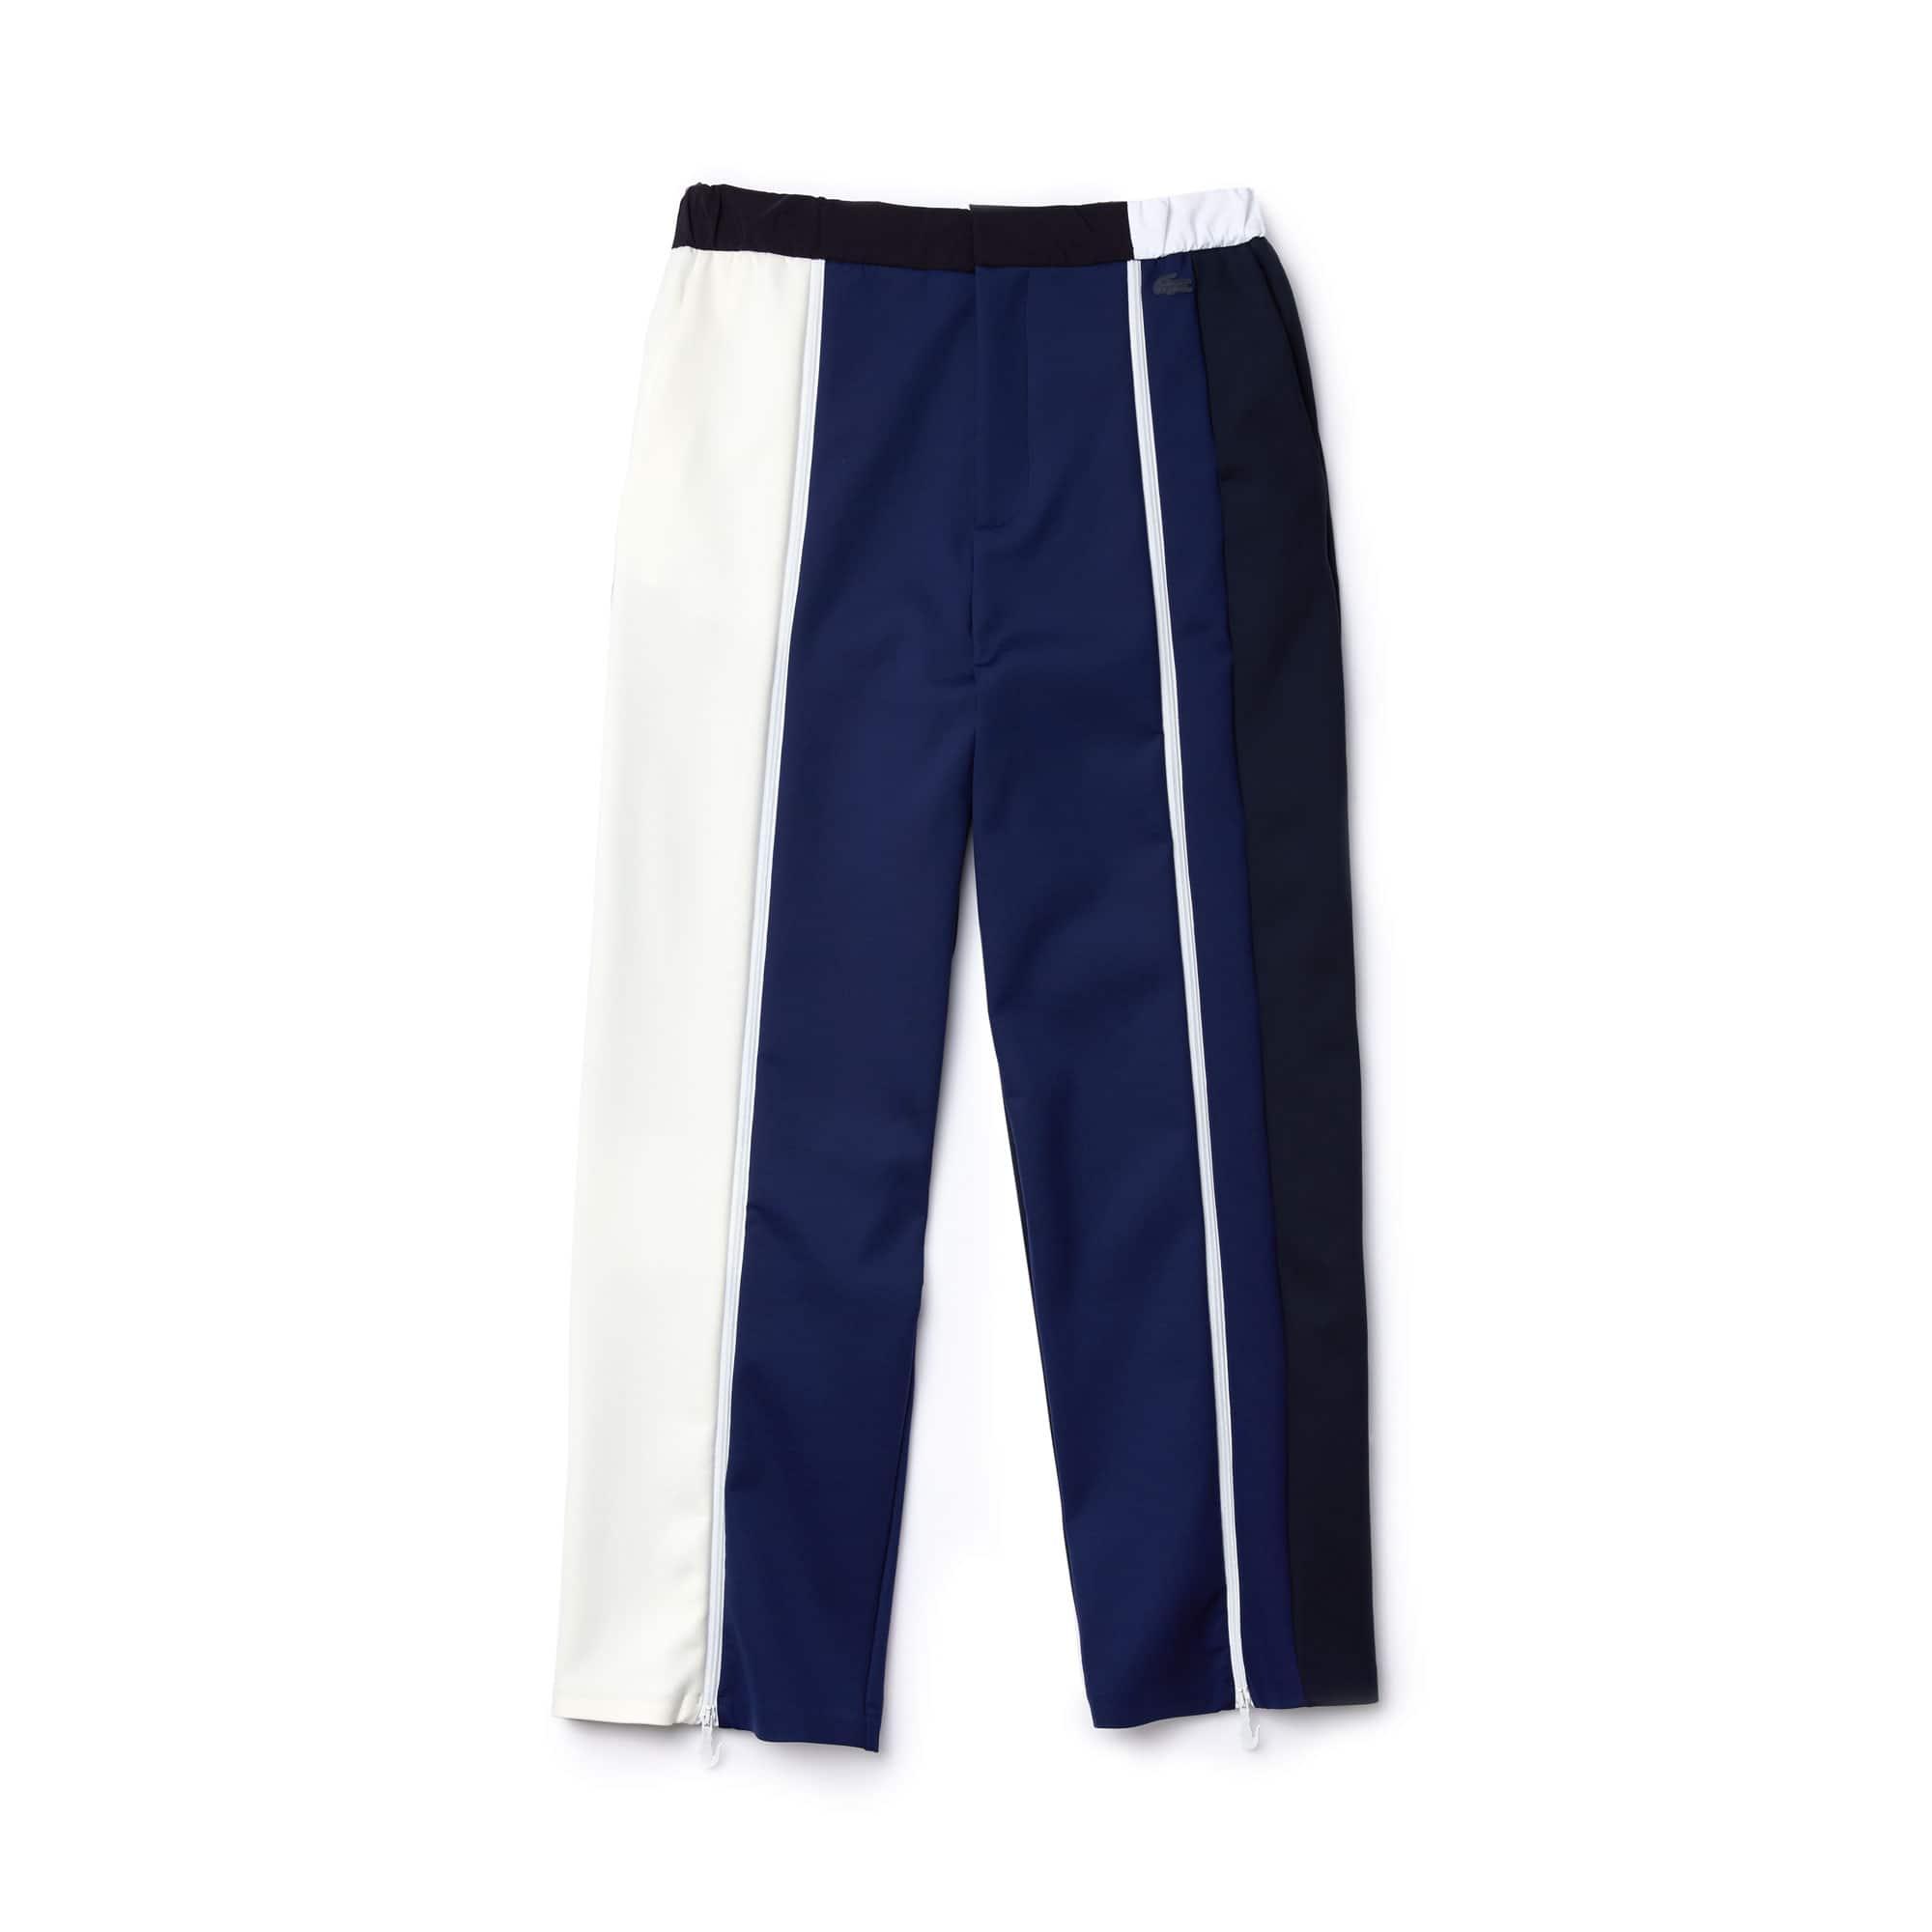 Lacoste Pants Unisex Fashion Show Multicolored Trackpants